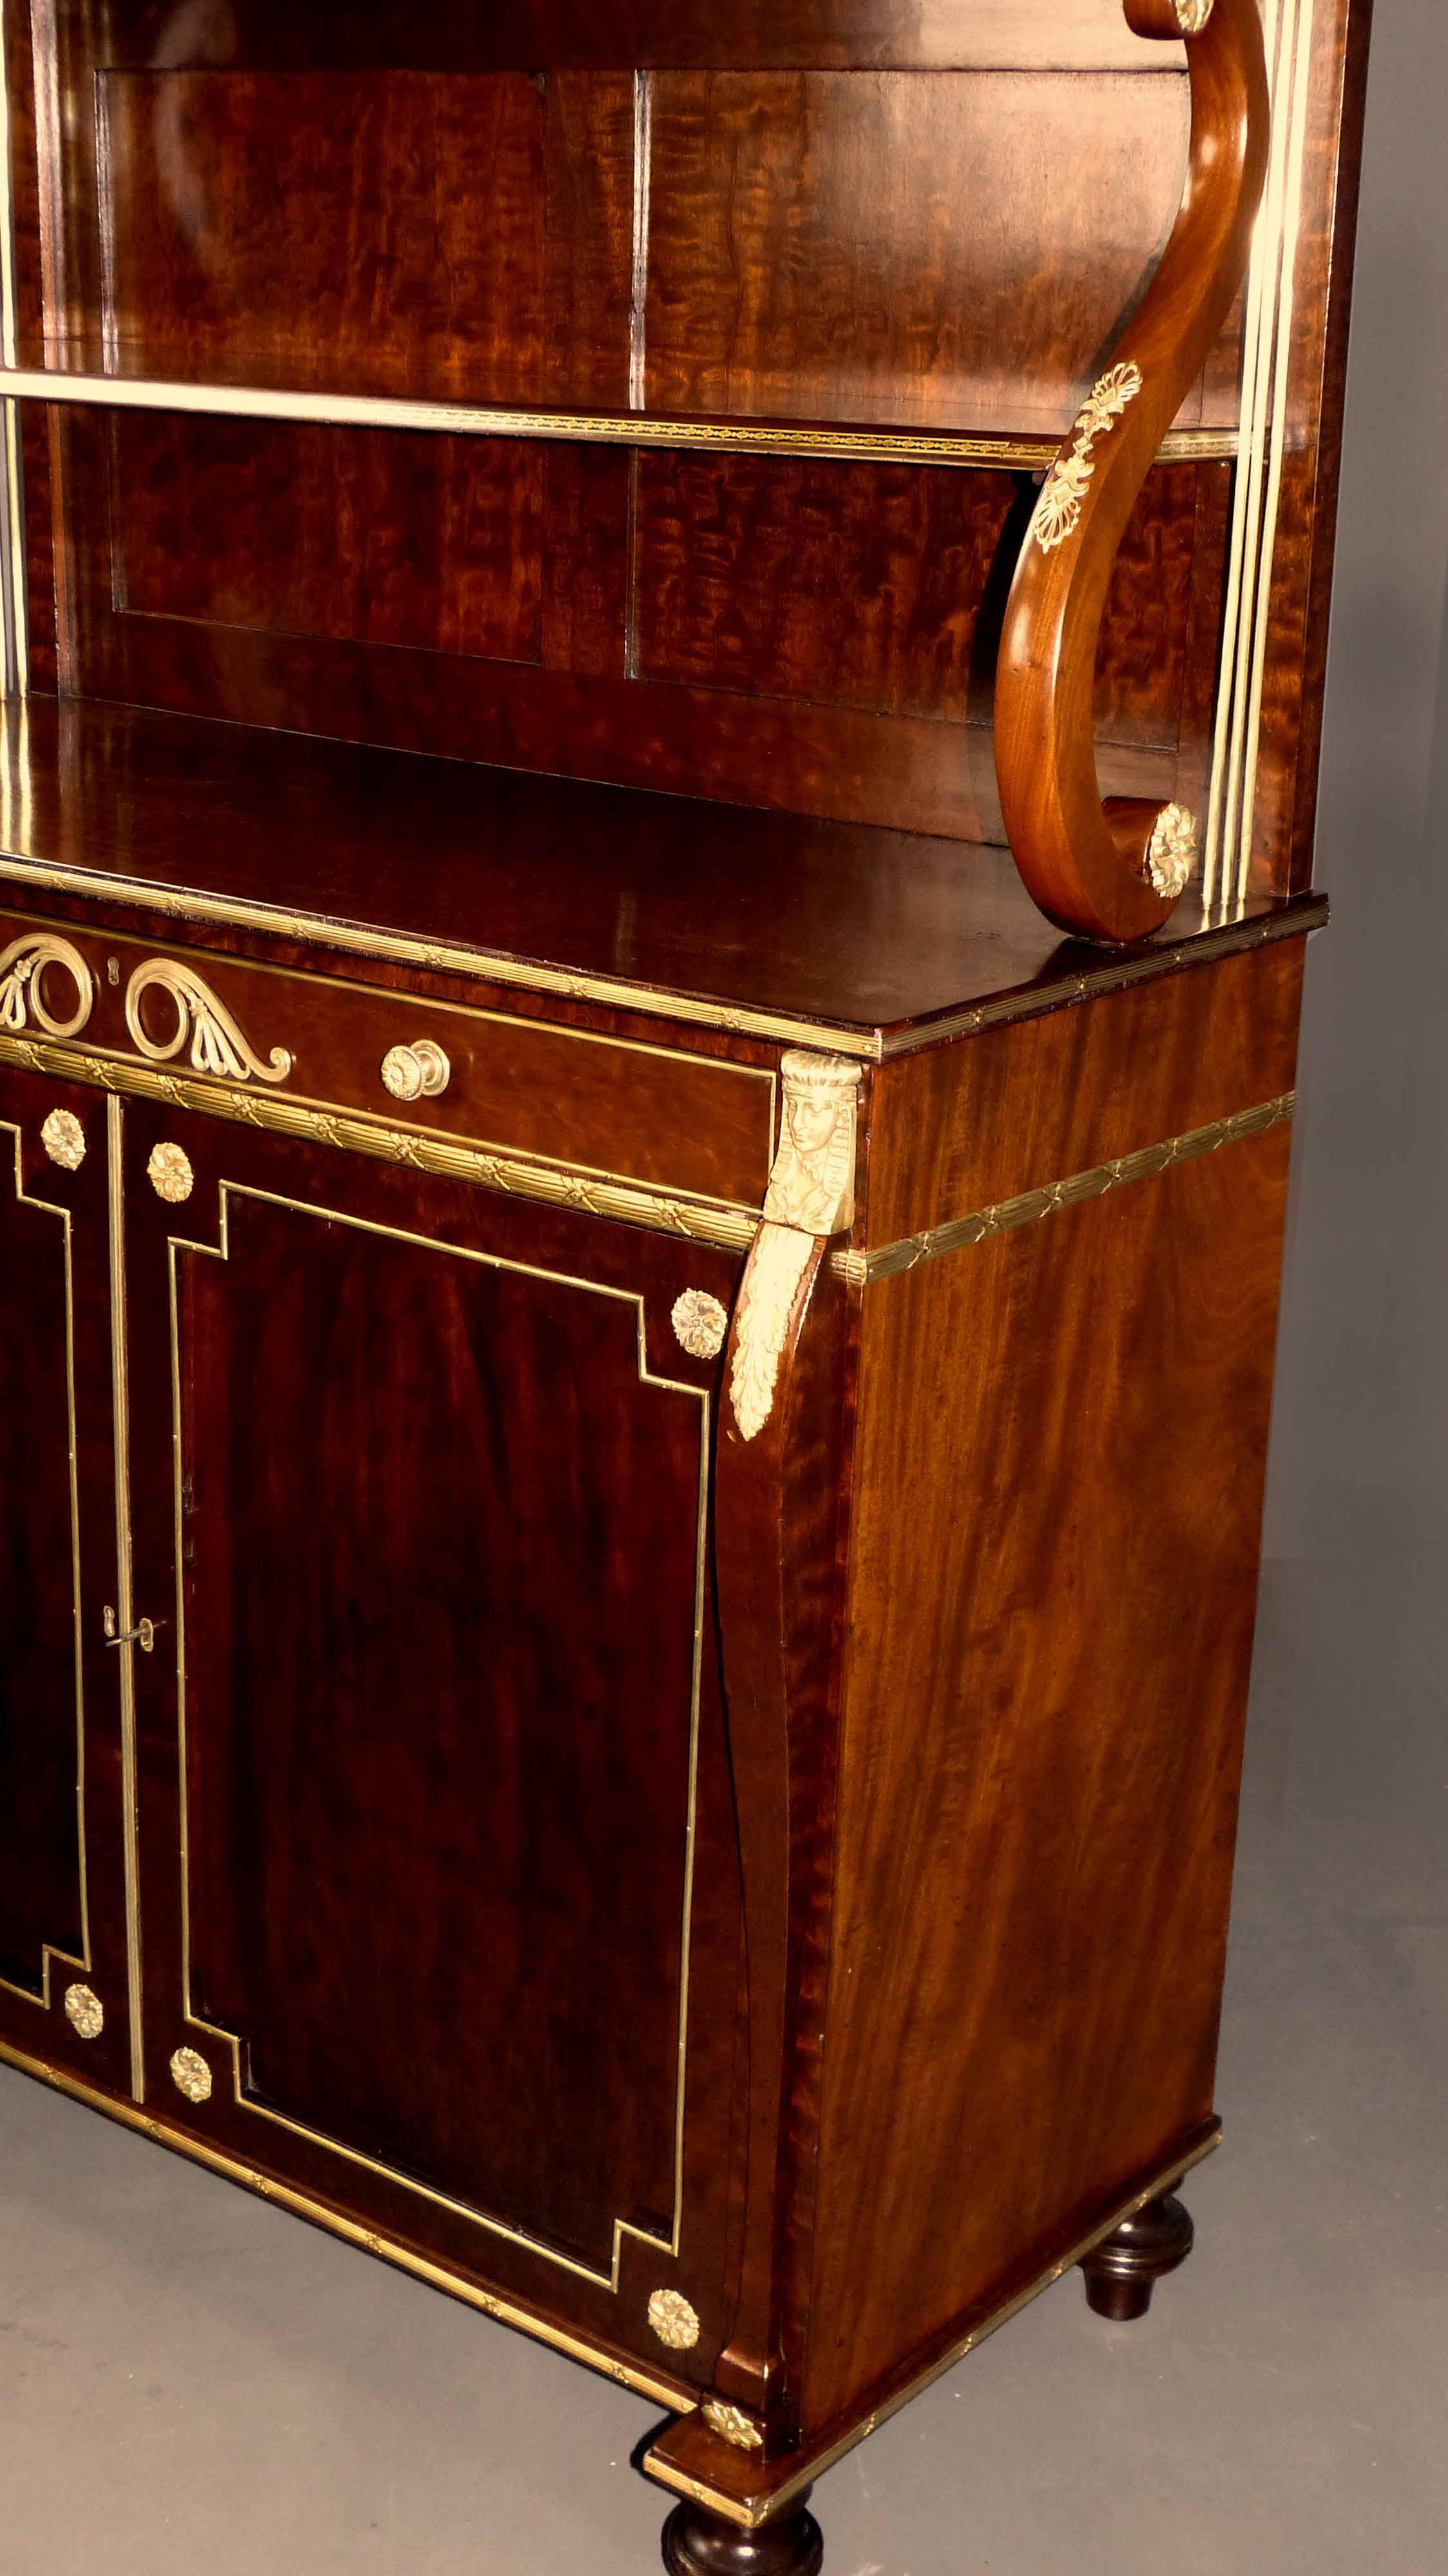 Mueble Ingles Anticuarium # Muebles Definicion En Ingles